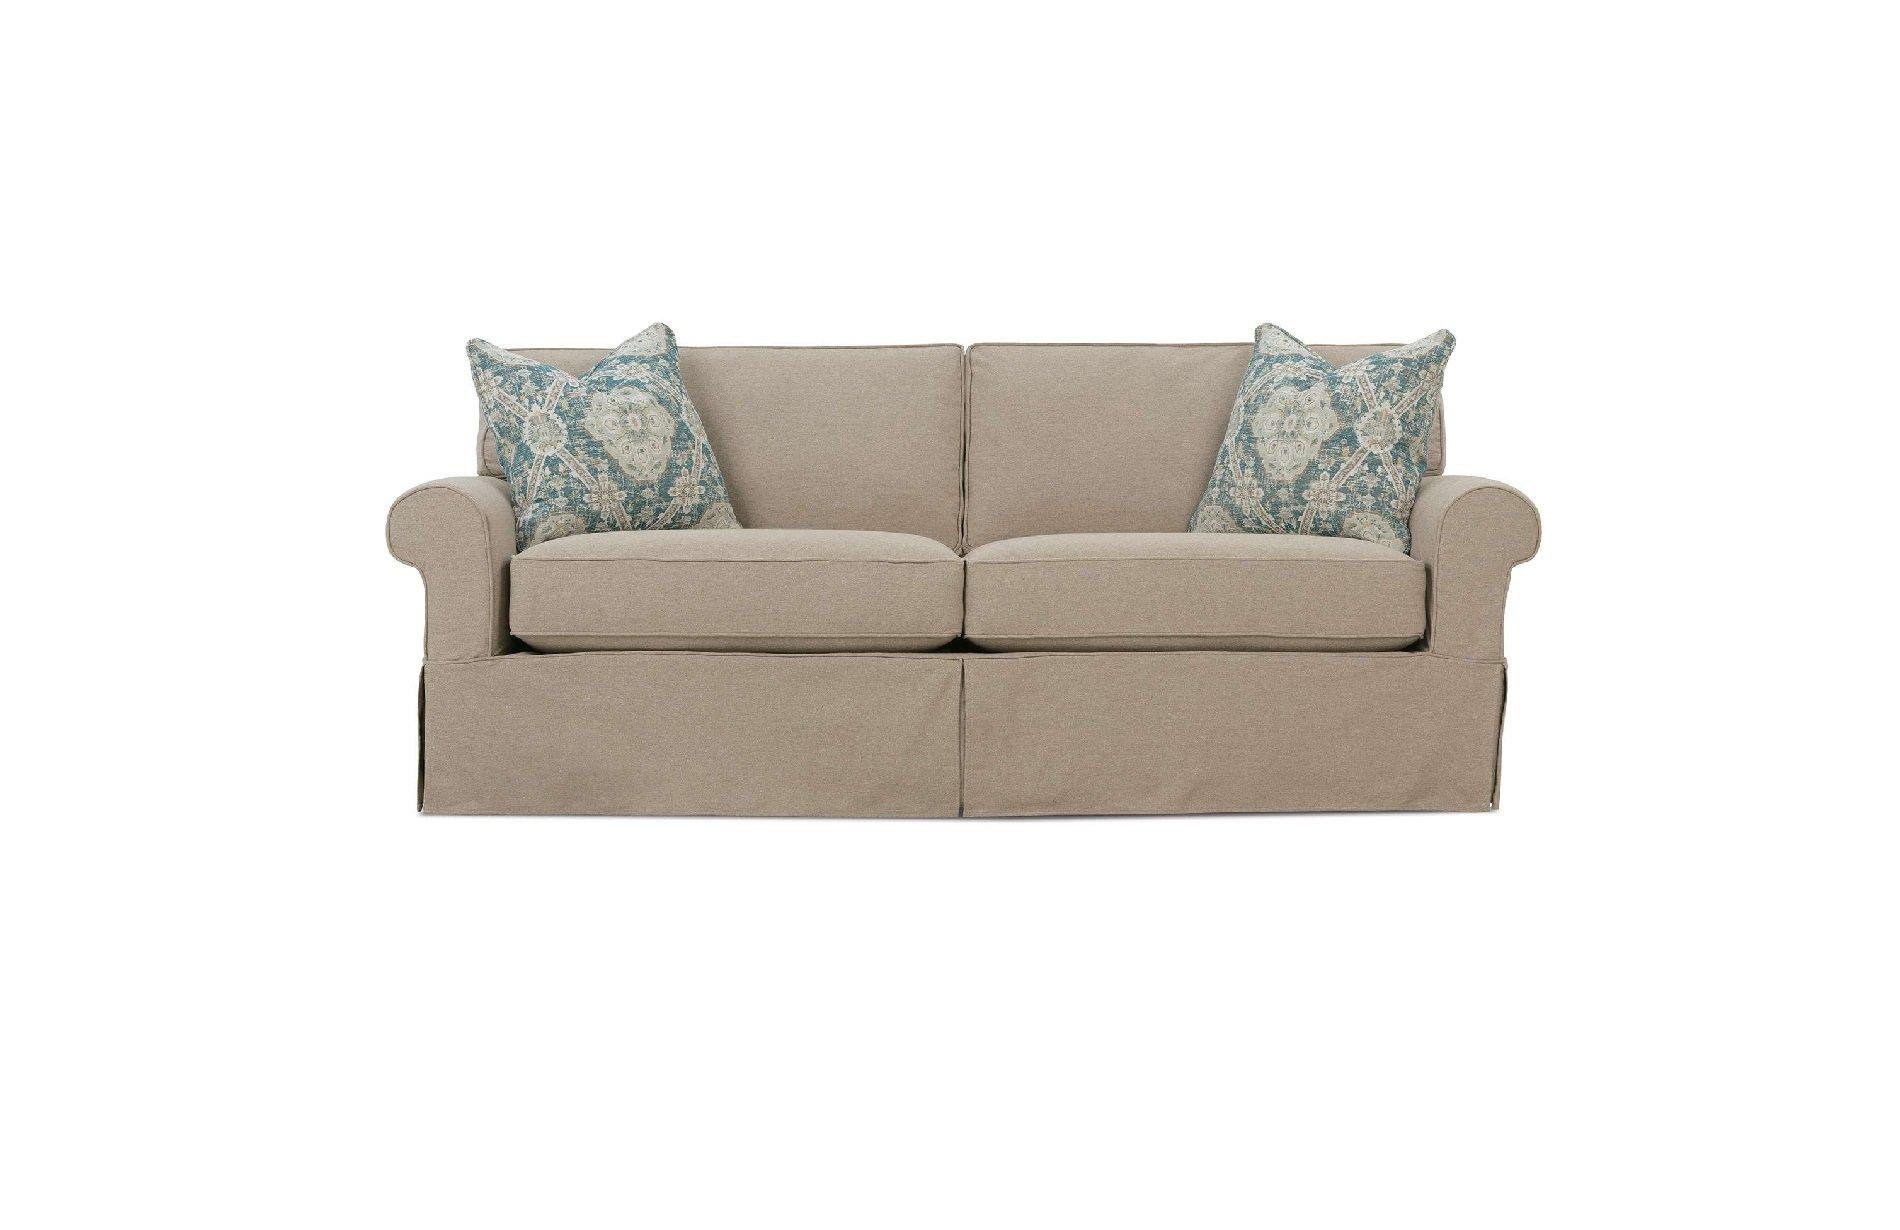 Rowe Nantucket Two Cushion Sofa